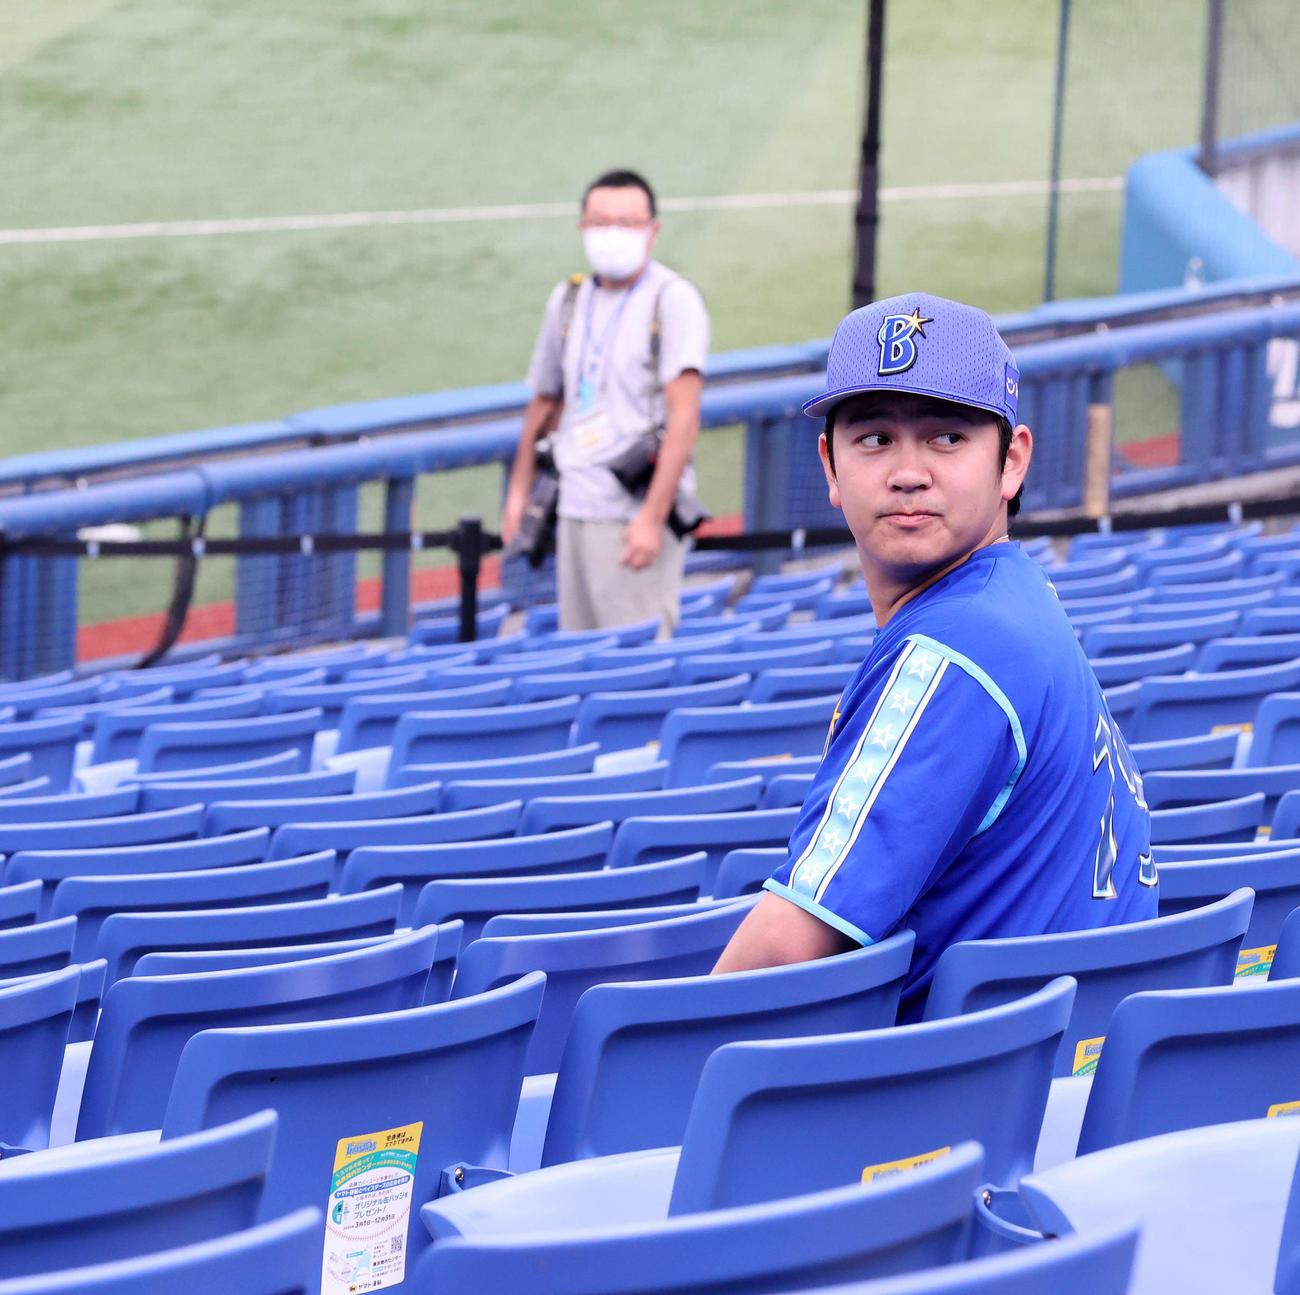 DeNA対楽天 試合前、横浜スタジアムのスタンドに座るDeNA山崎(撮影・江口和貴)